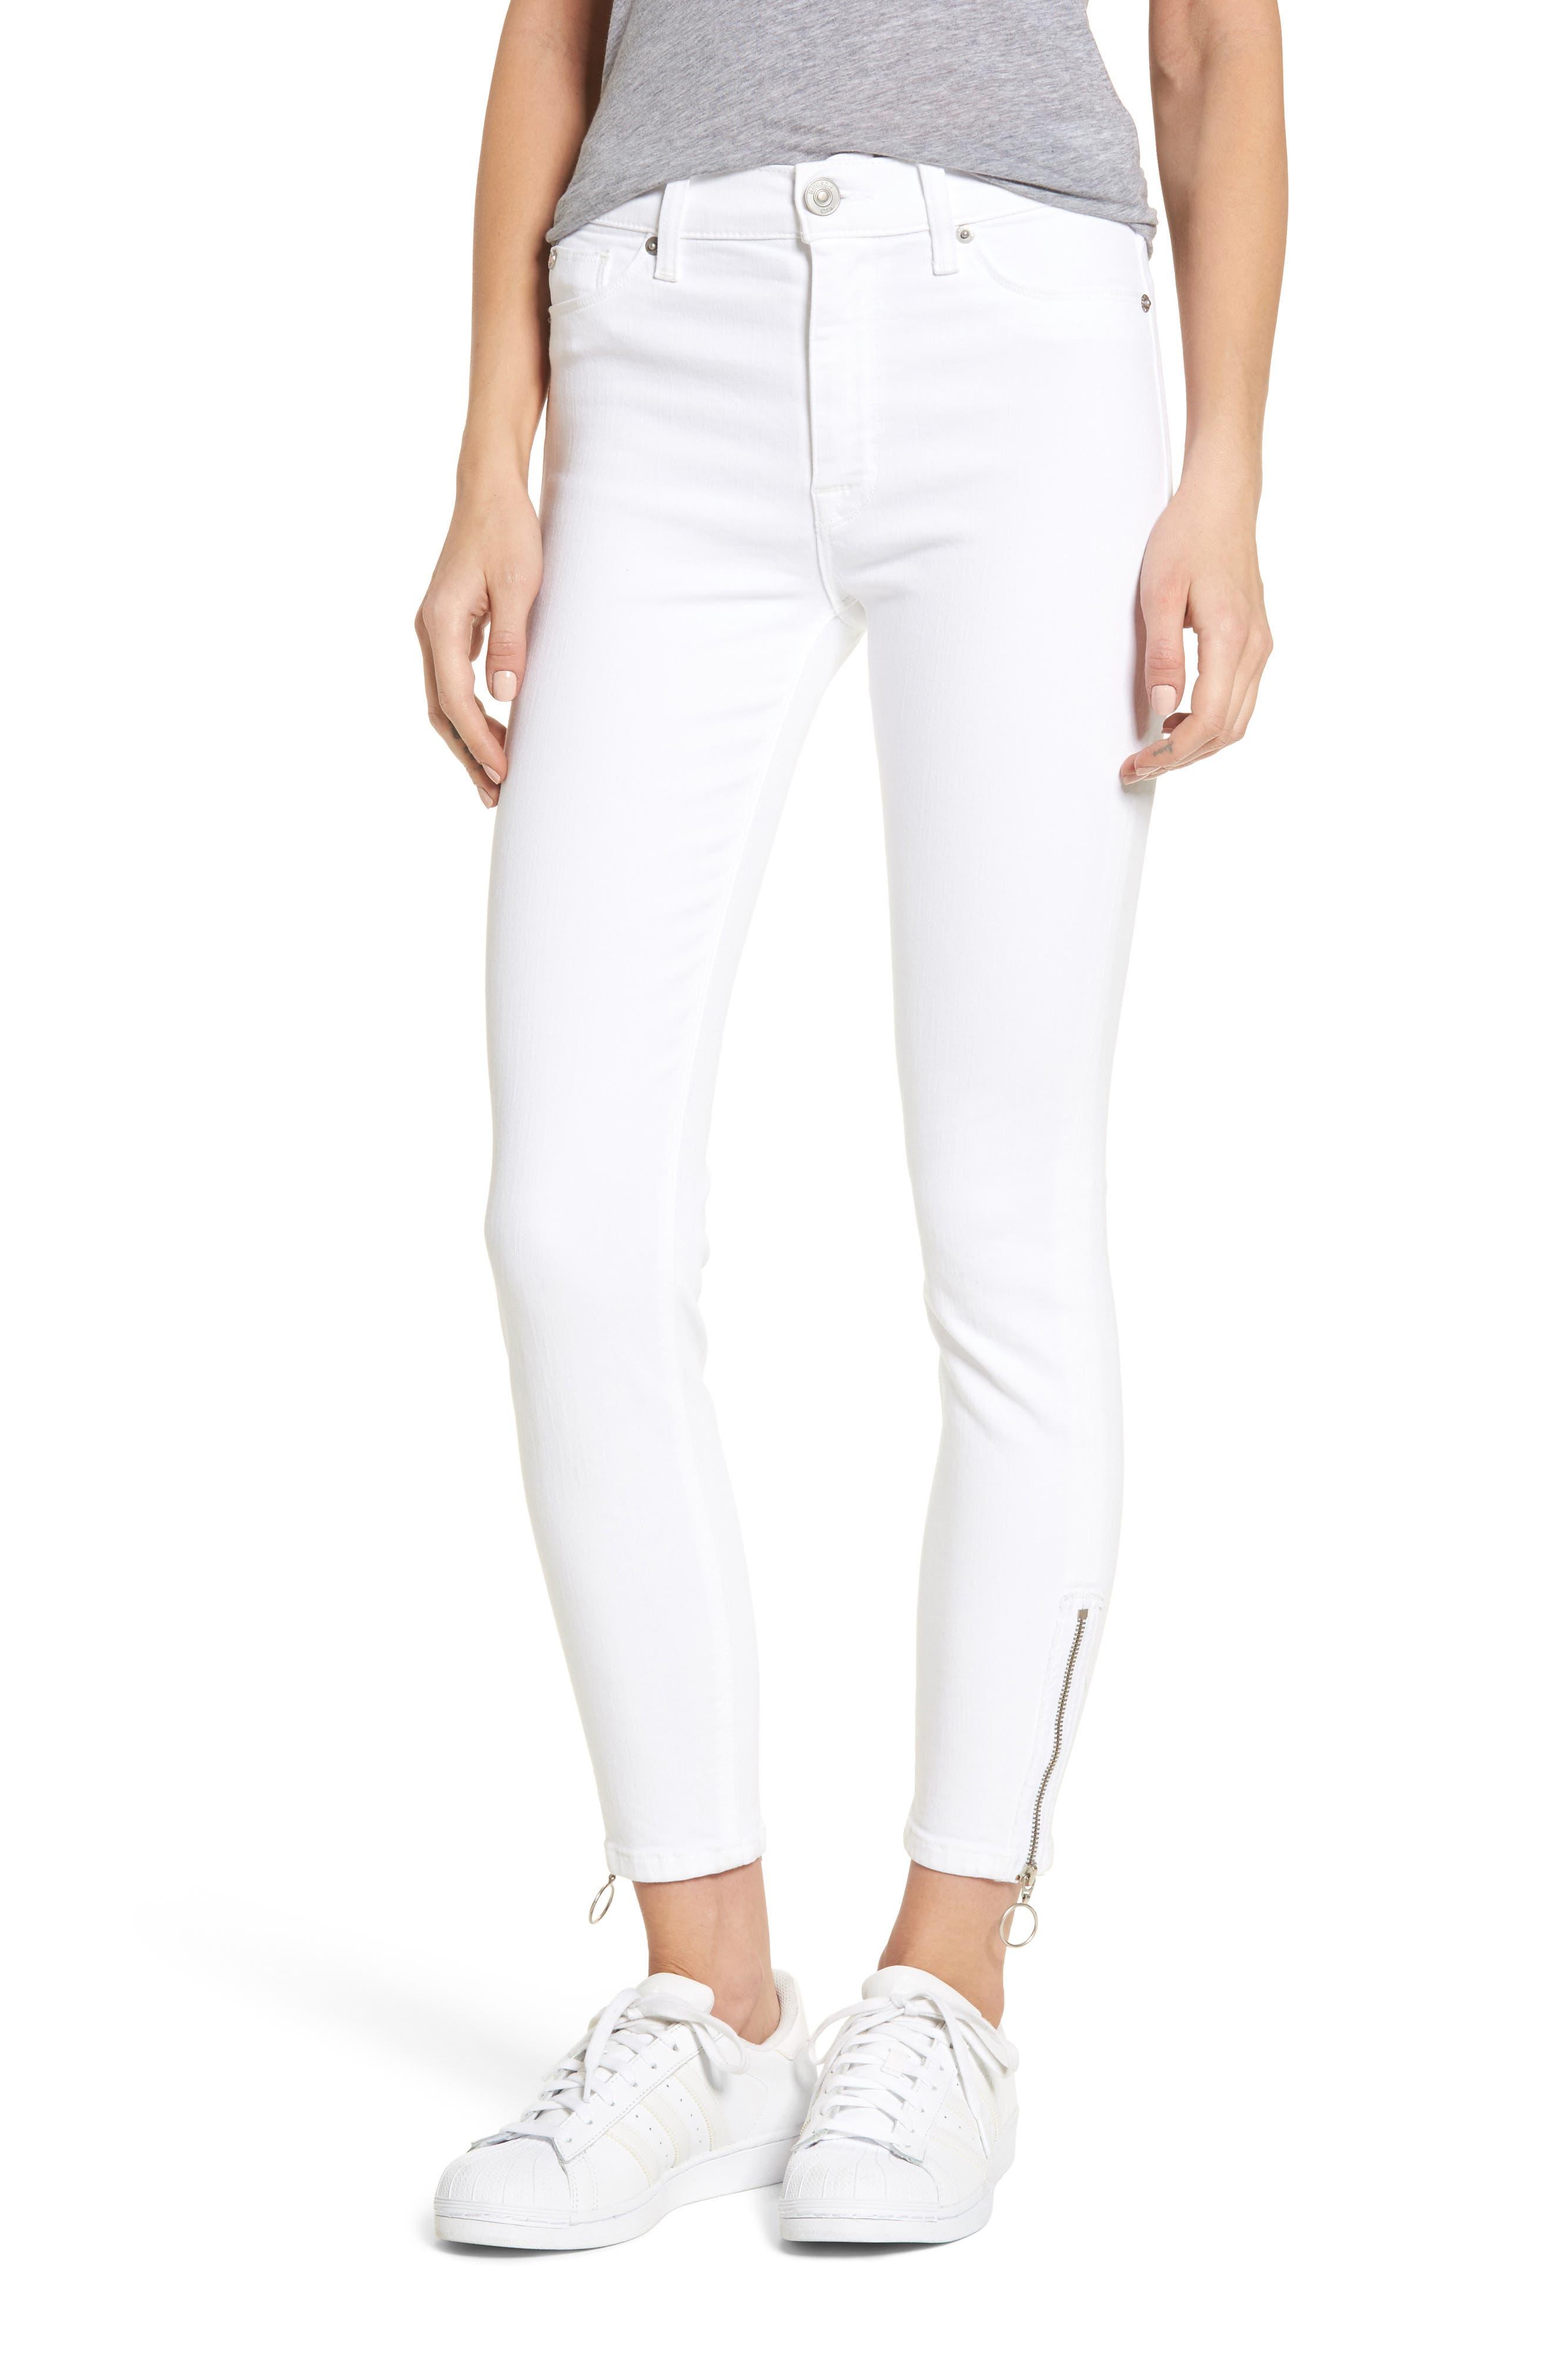 Barbara High Waist Ankle Skinny Jeans,                             Main thumbnail 1, color,                             110